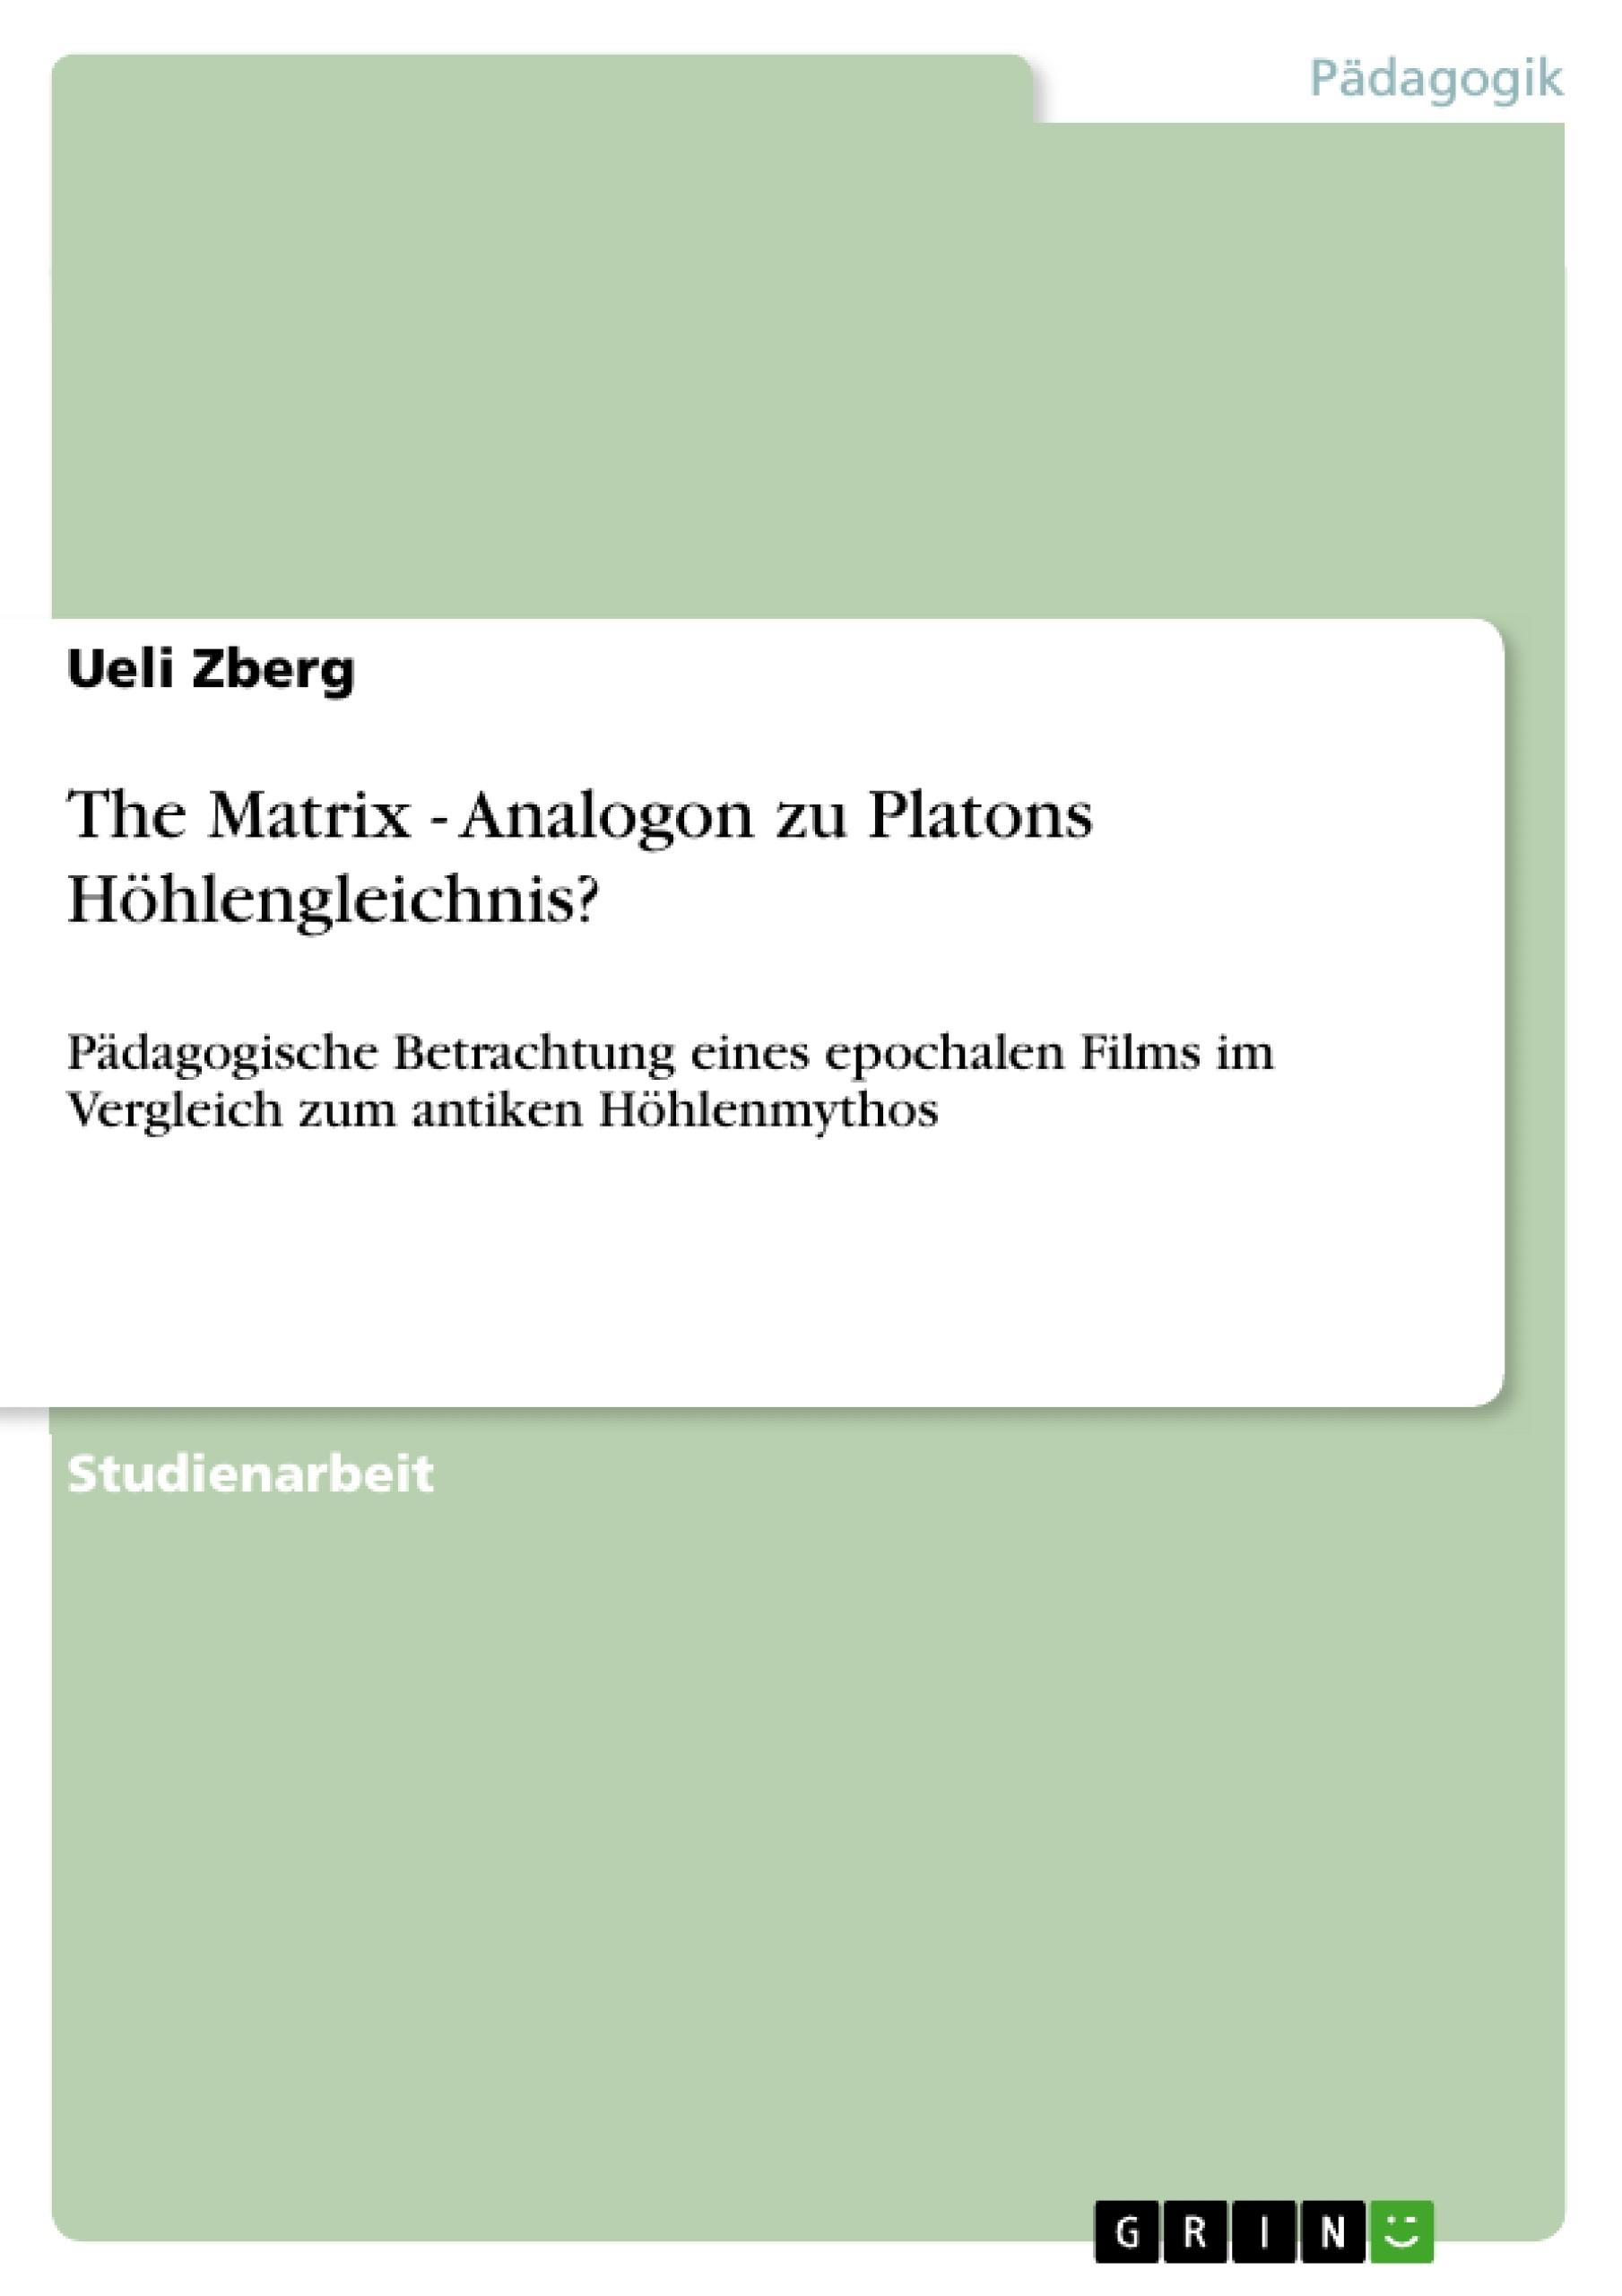 Titel: The Matrix - Analogon zu Platons Höhlengleichnis?